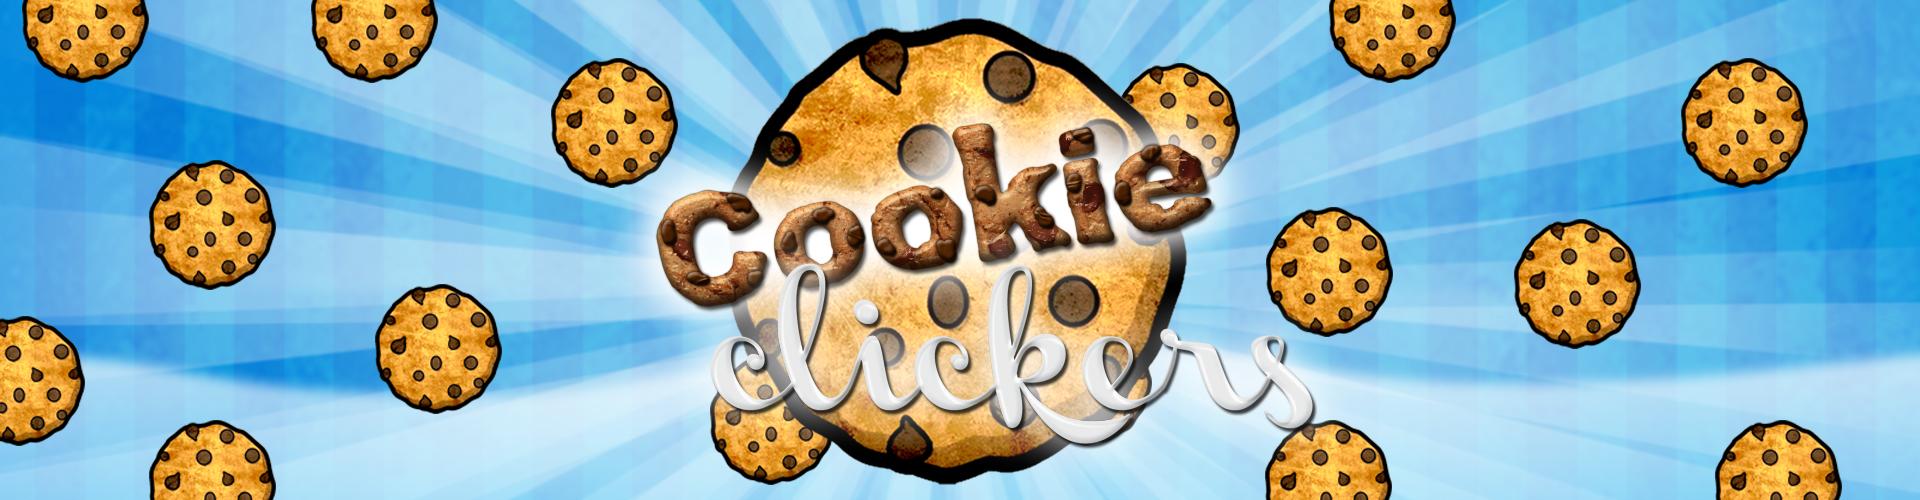 Cookie Clickers - redBit games